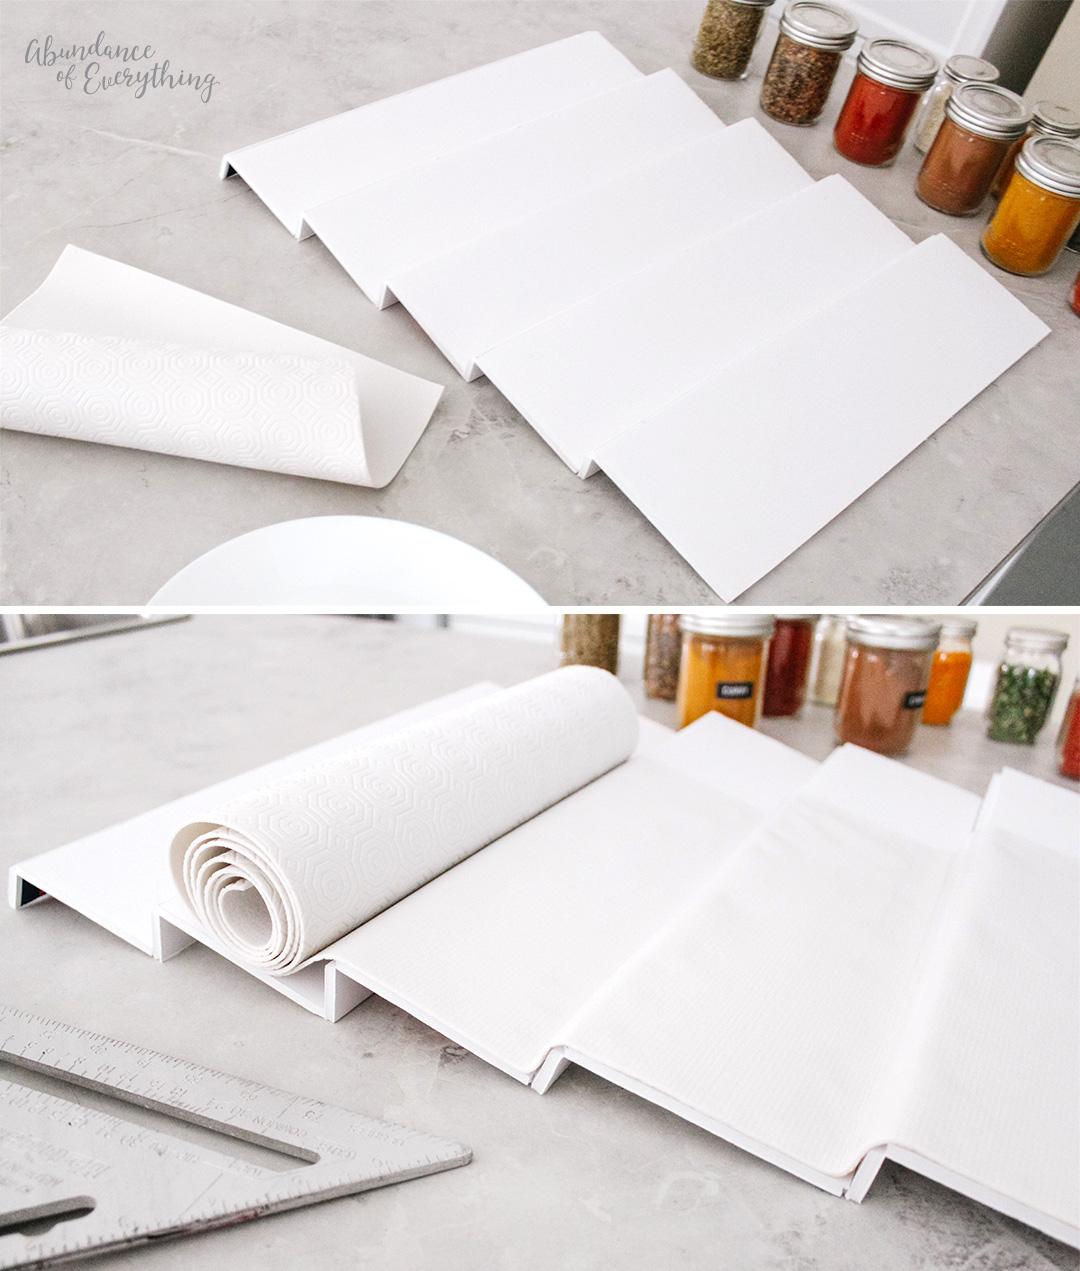 Hot glue drawer liner to spice shelf.